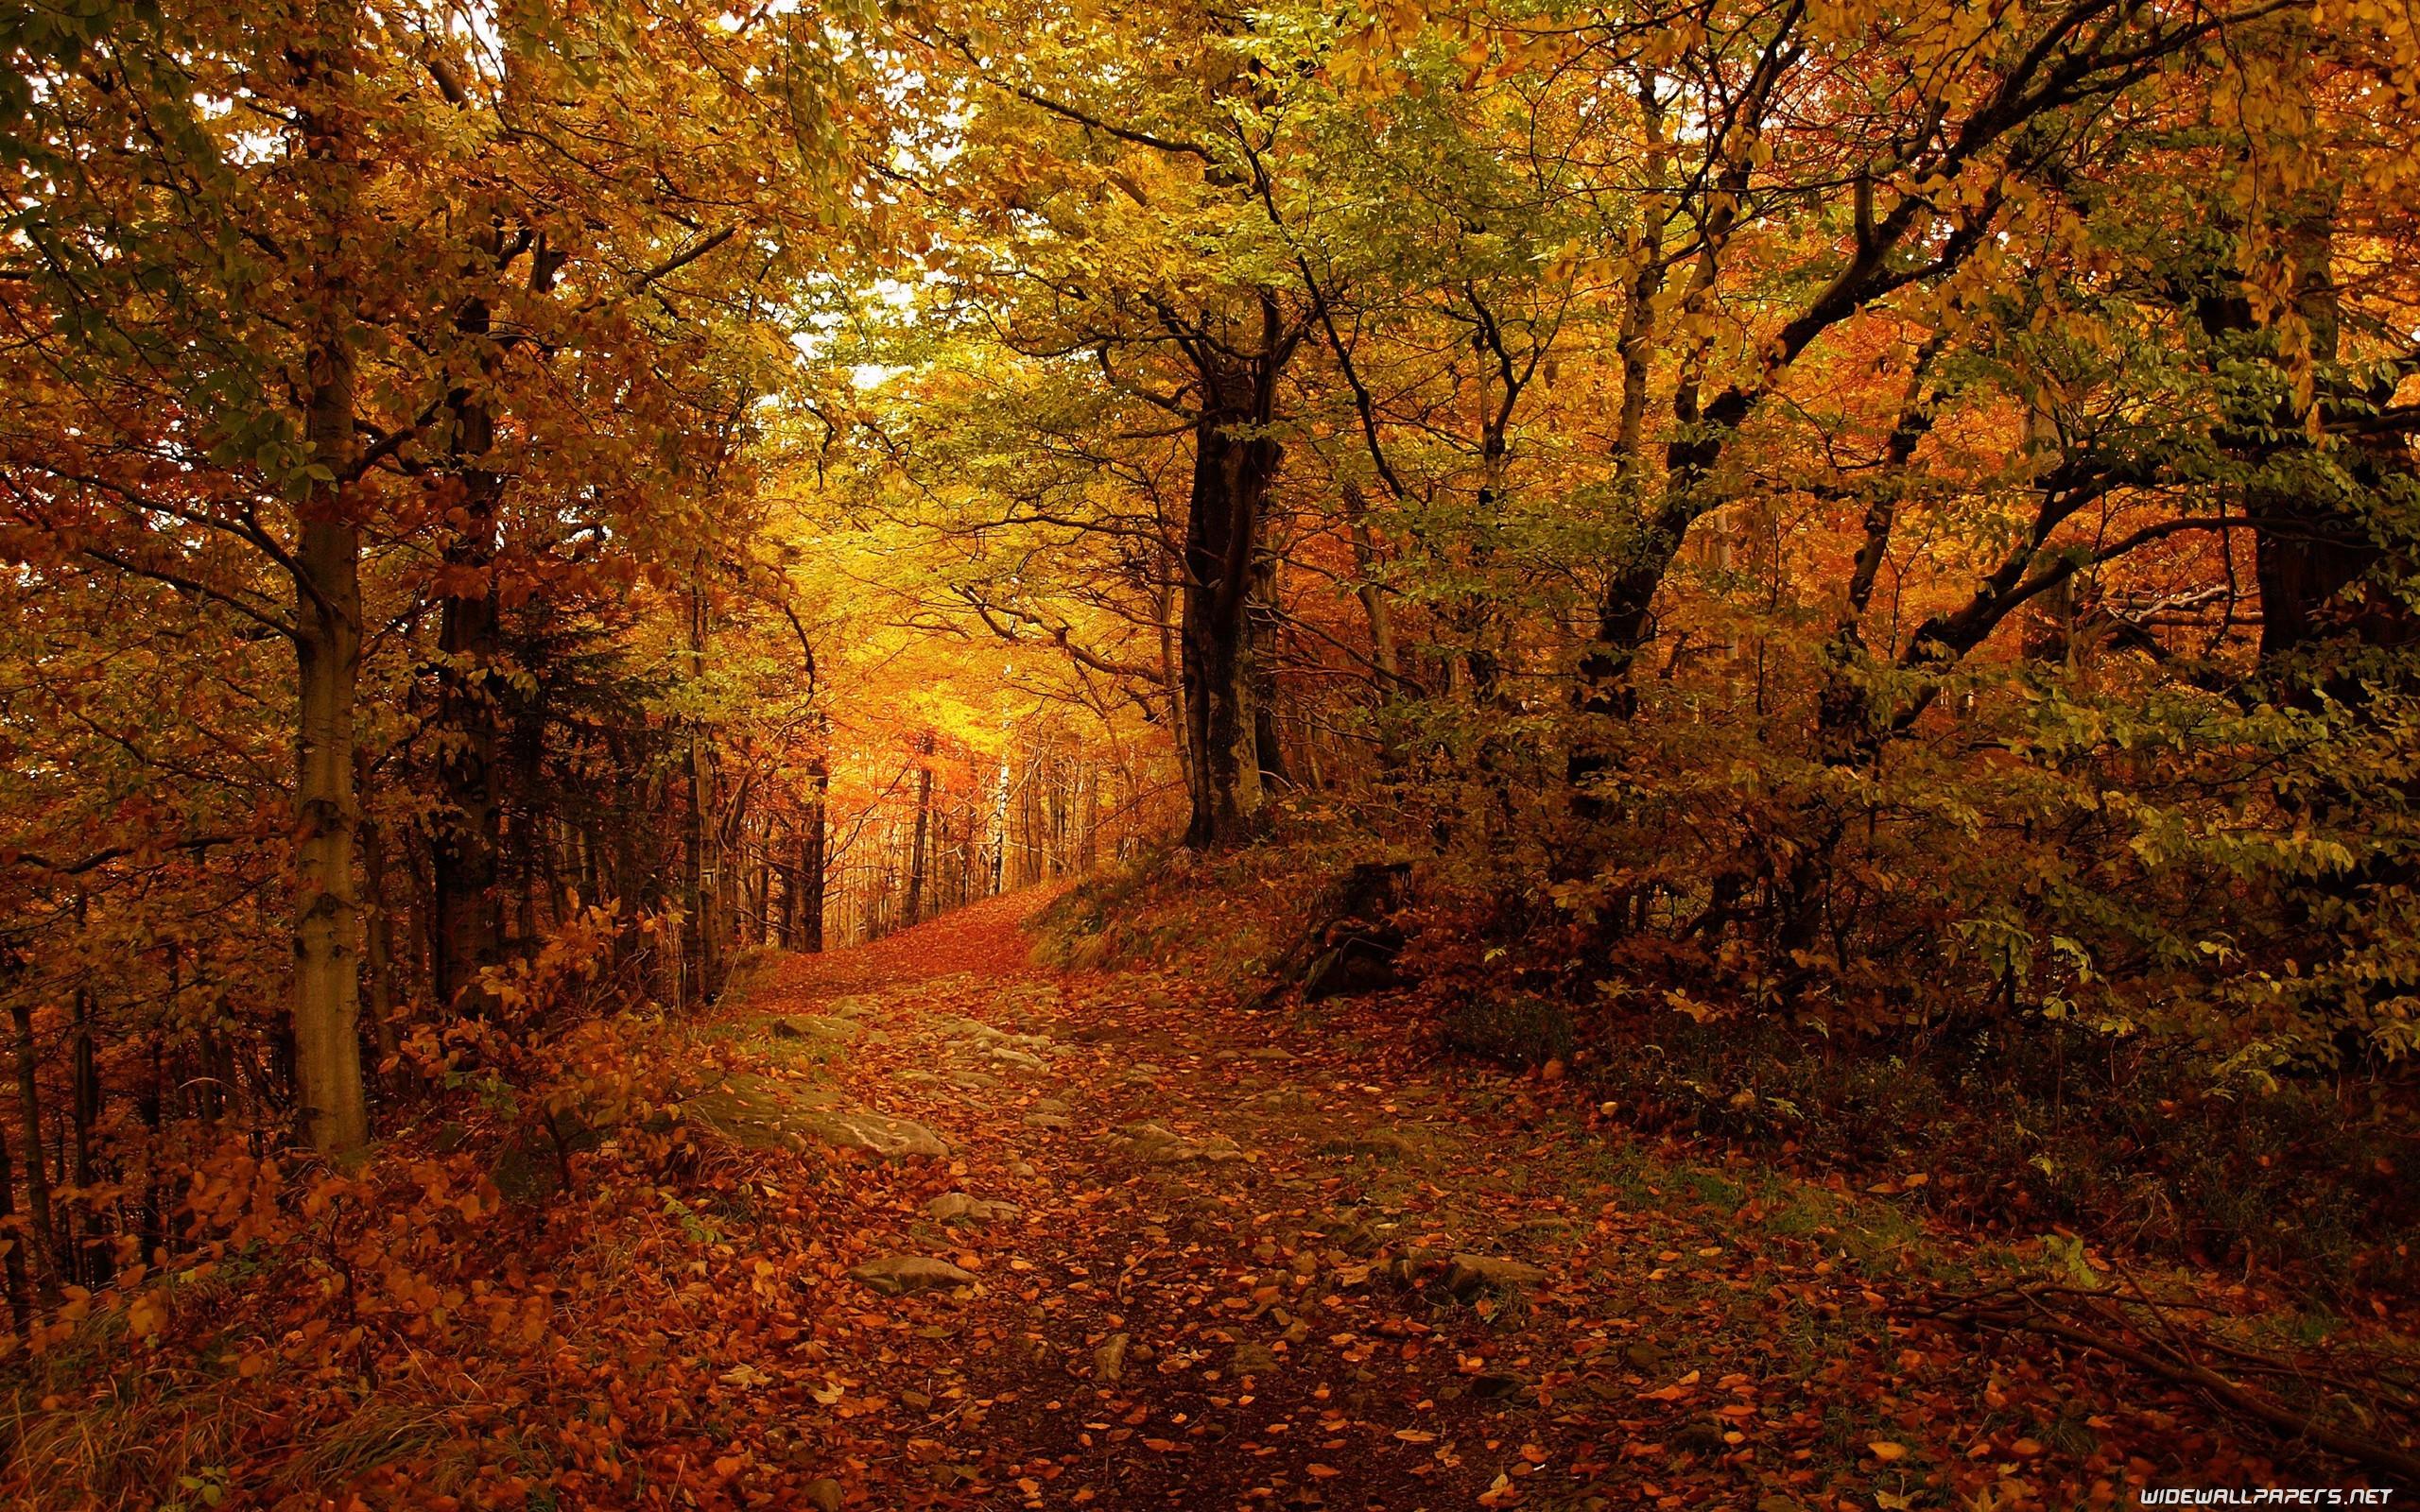 Fall Leaves Ipad Wallpaper Autumn Desktop Wallpaper 183 ① Download Free Stunning Full Hd